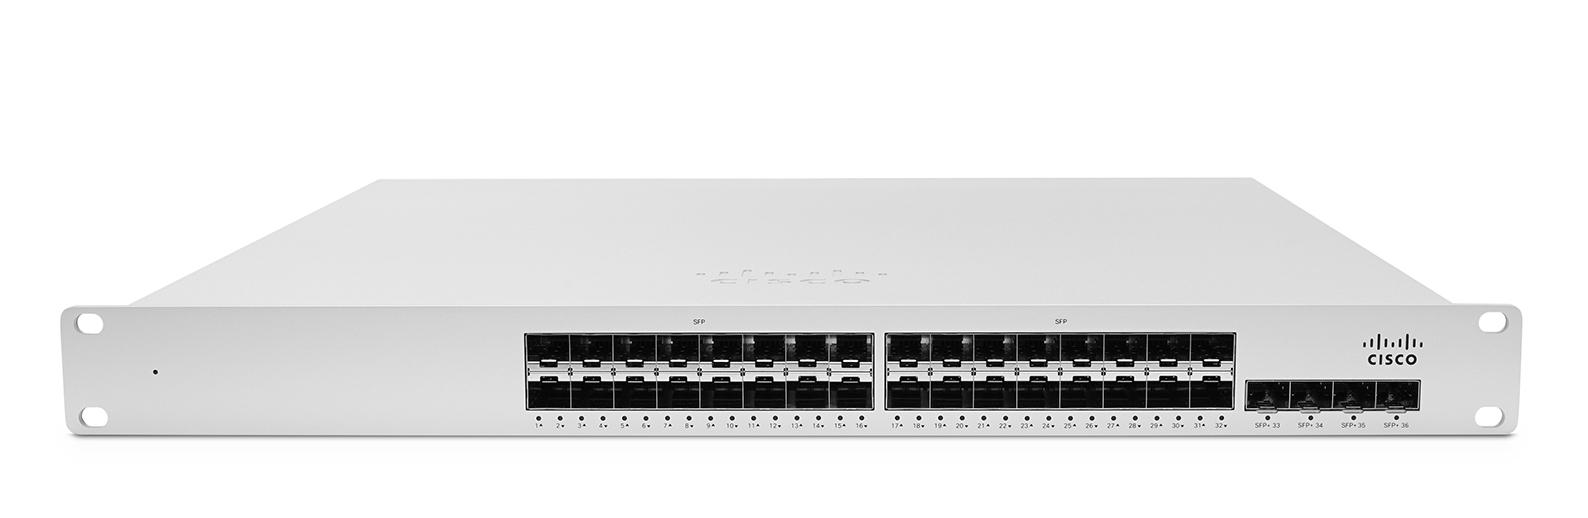 Cisco Meraki Stackable Access Switch MS410-32